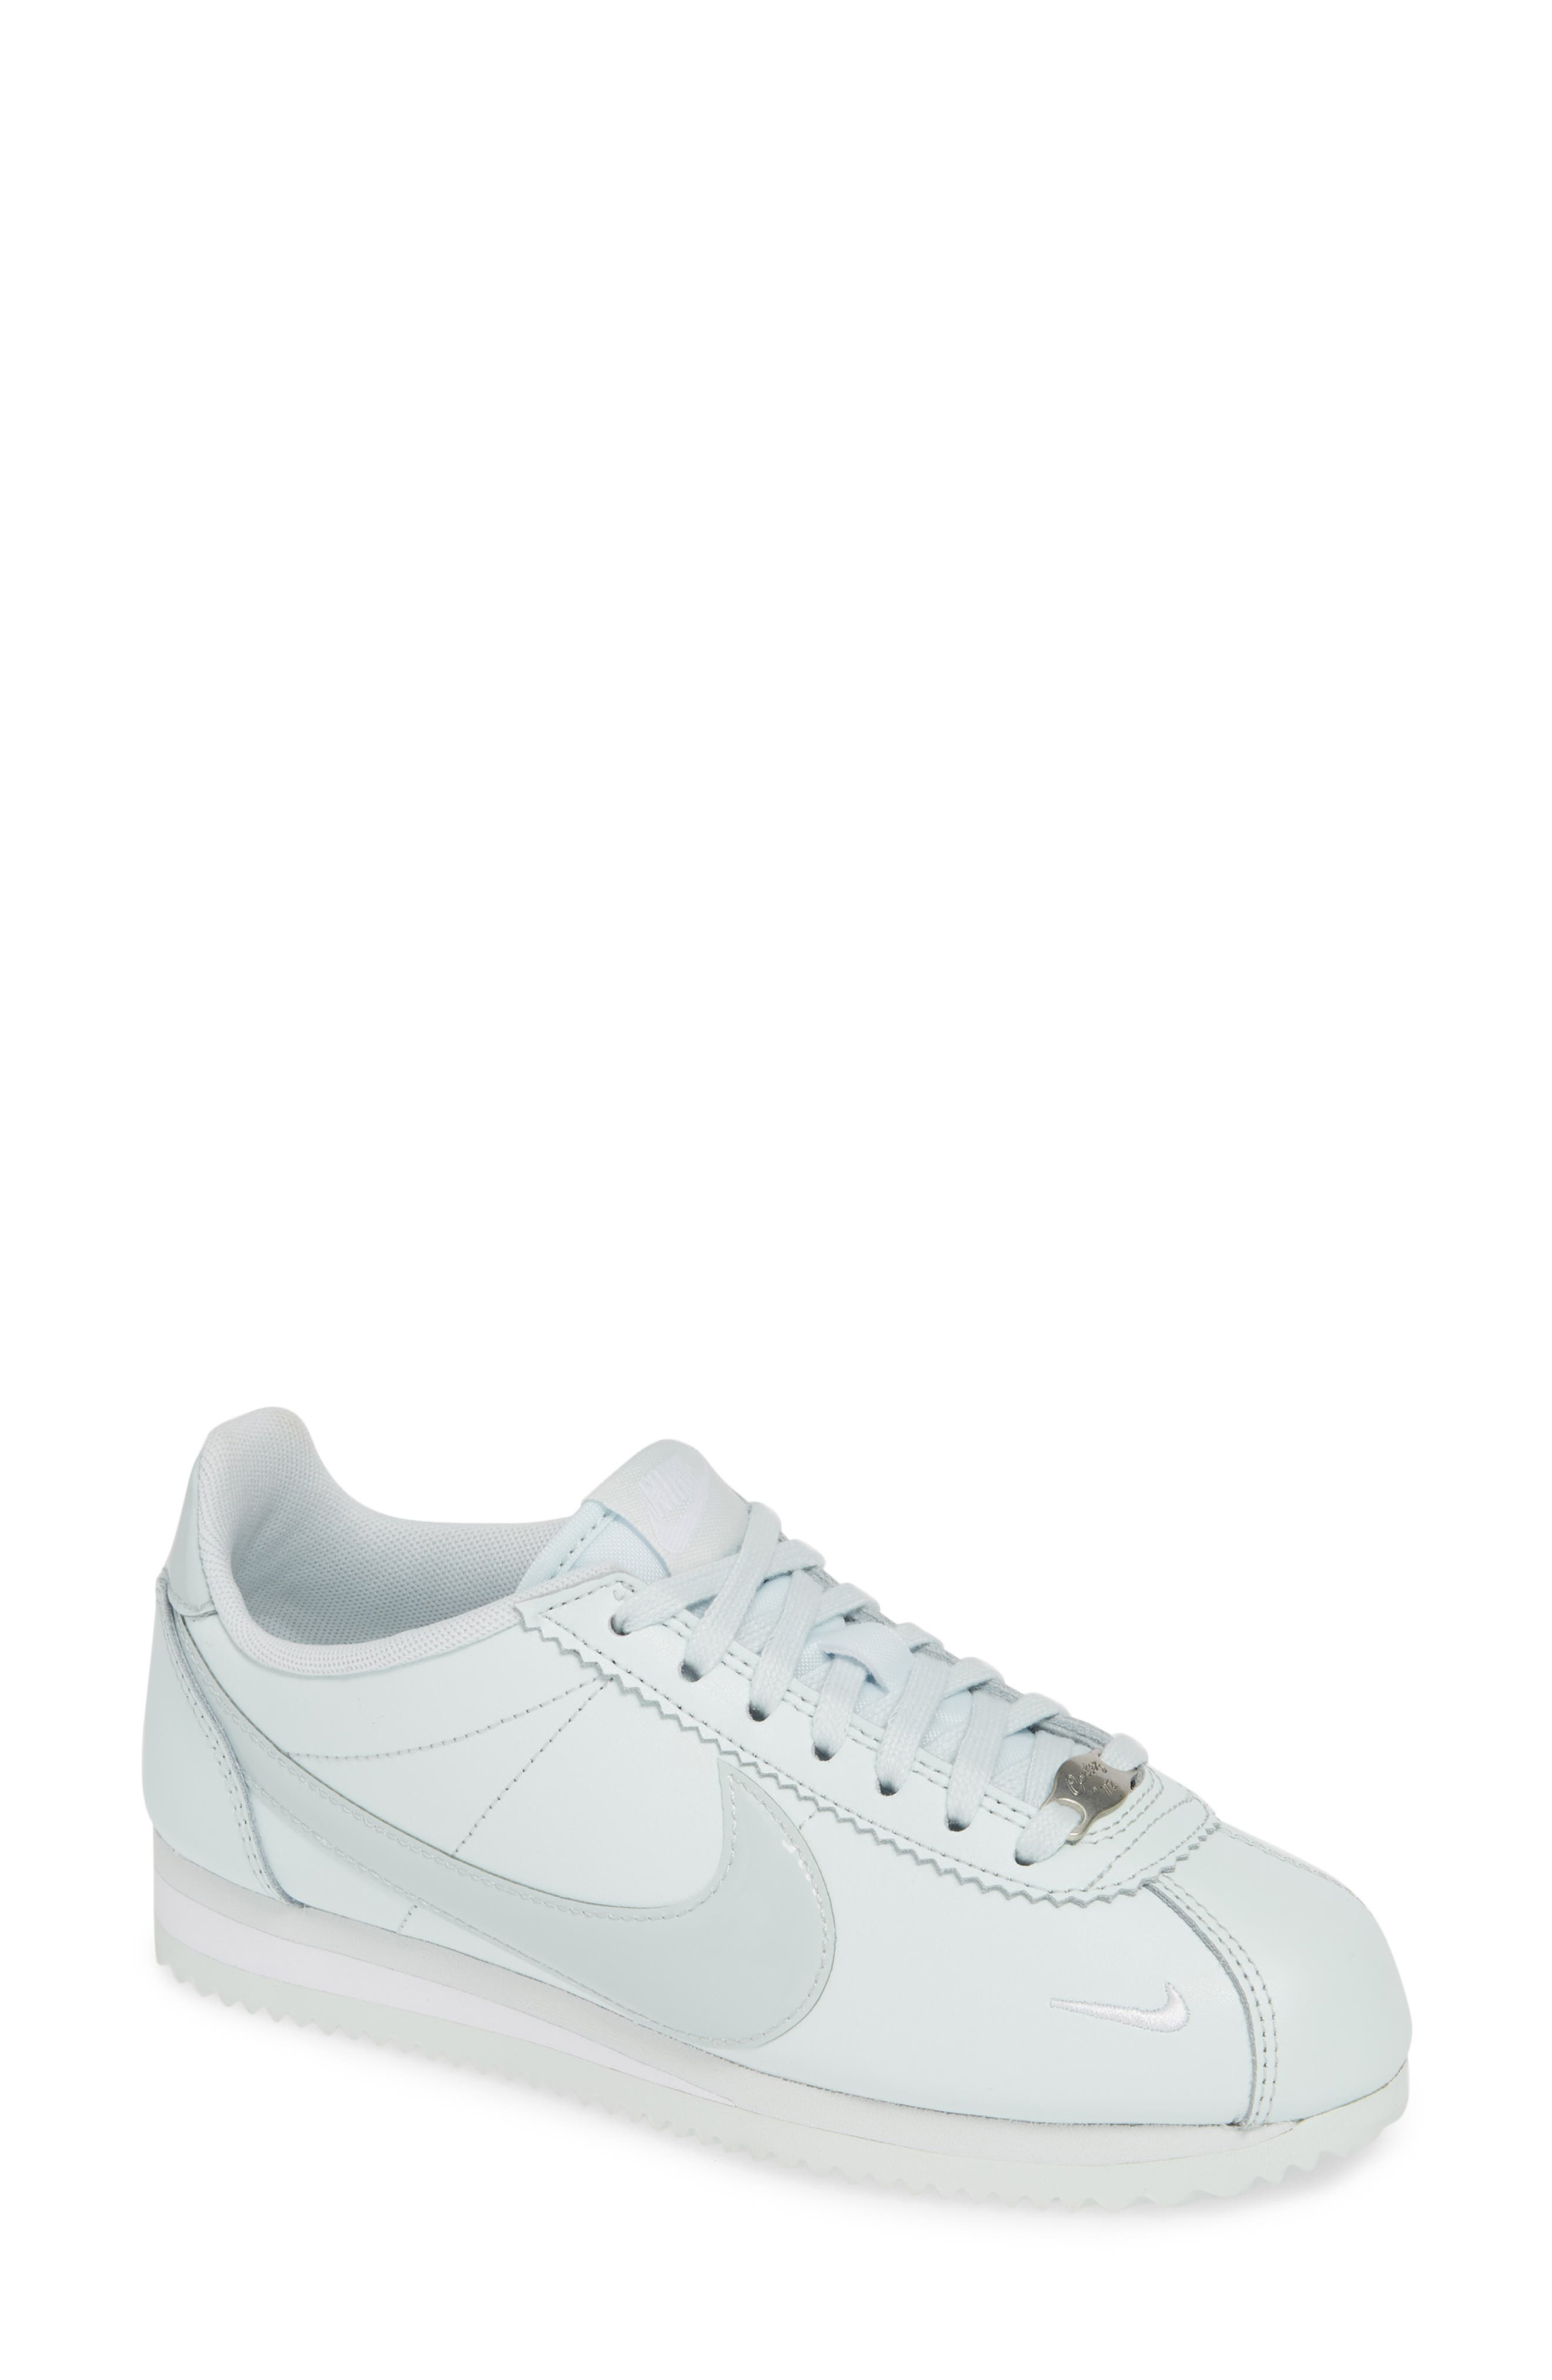 NIKE, Classic Cortez Premium XLV Sneaker, Main thumbnail 1, color, BARELY GREY/ WHITE